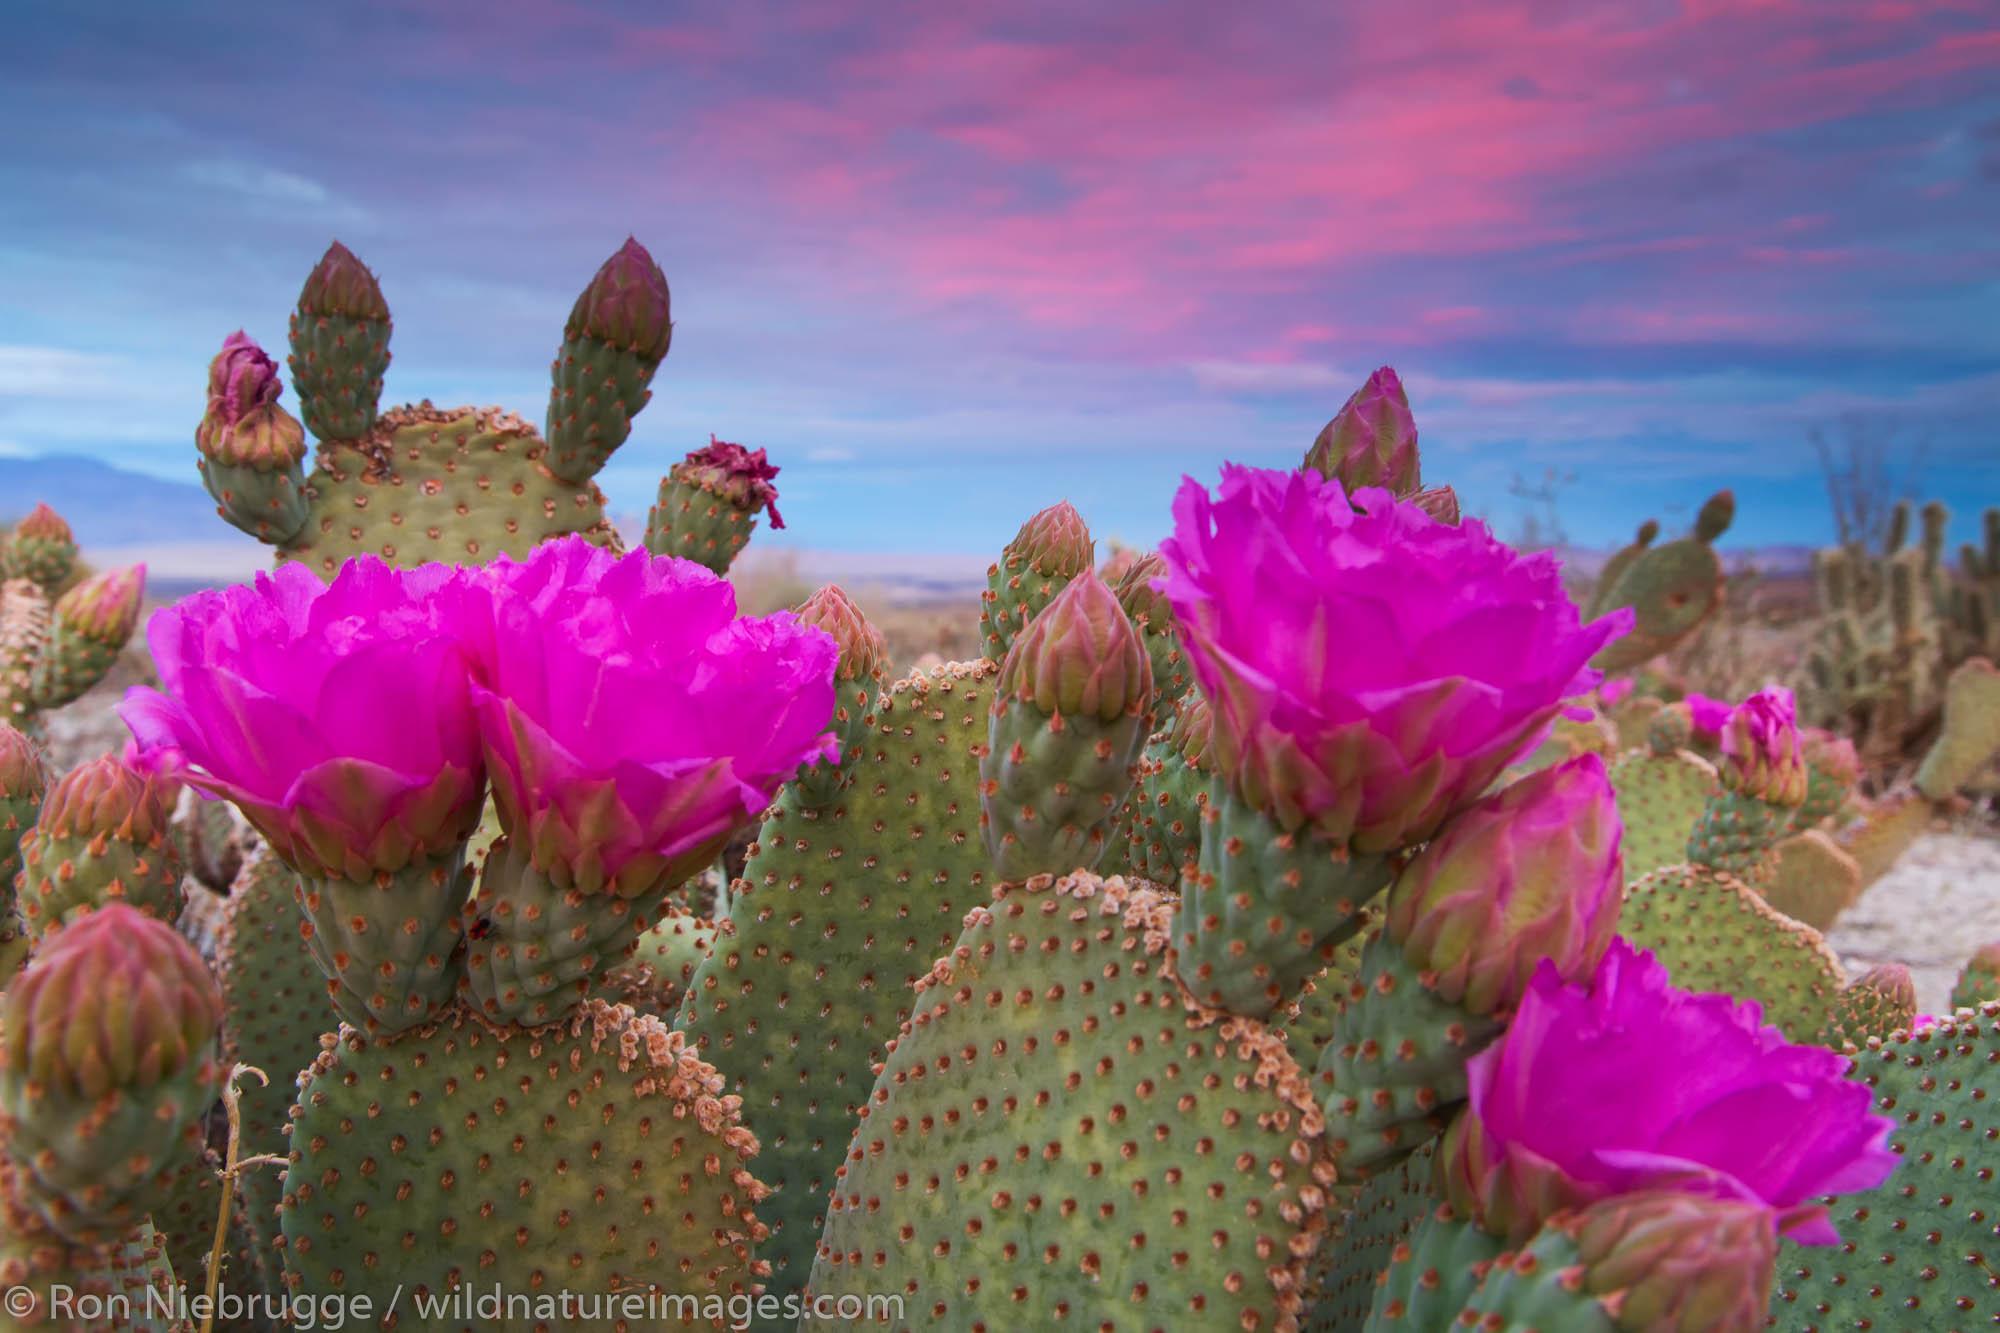 Beavertail Cactus in bloom, Anza-Borrego Desert State Park, California.